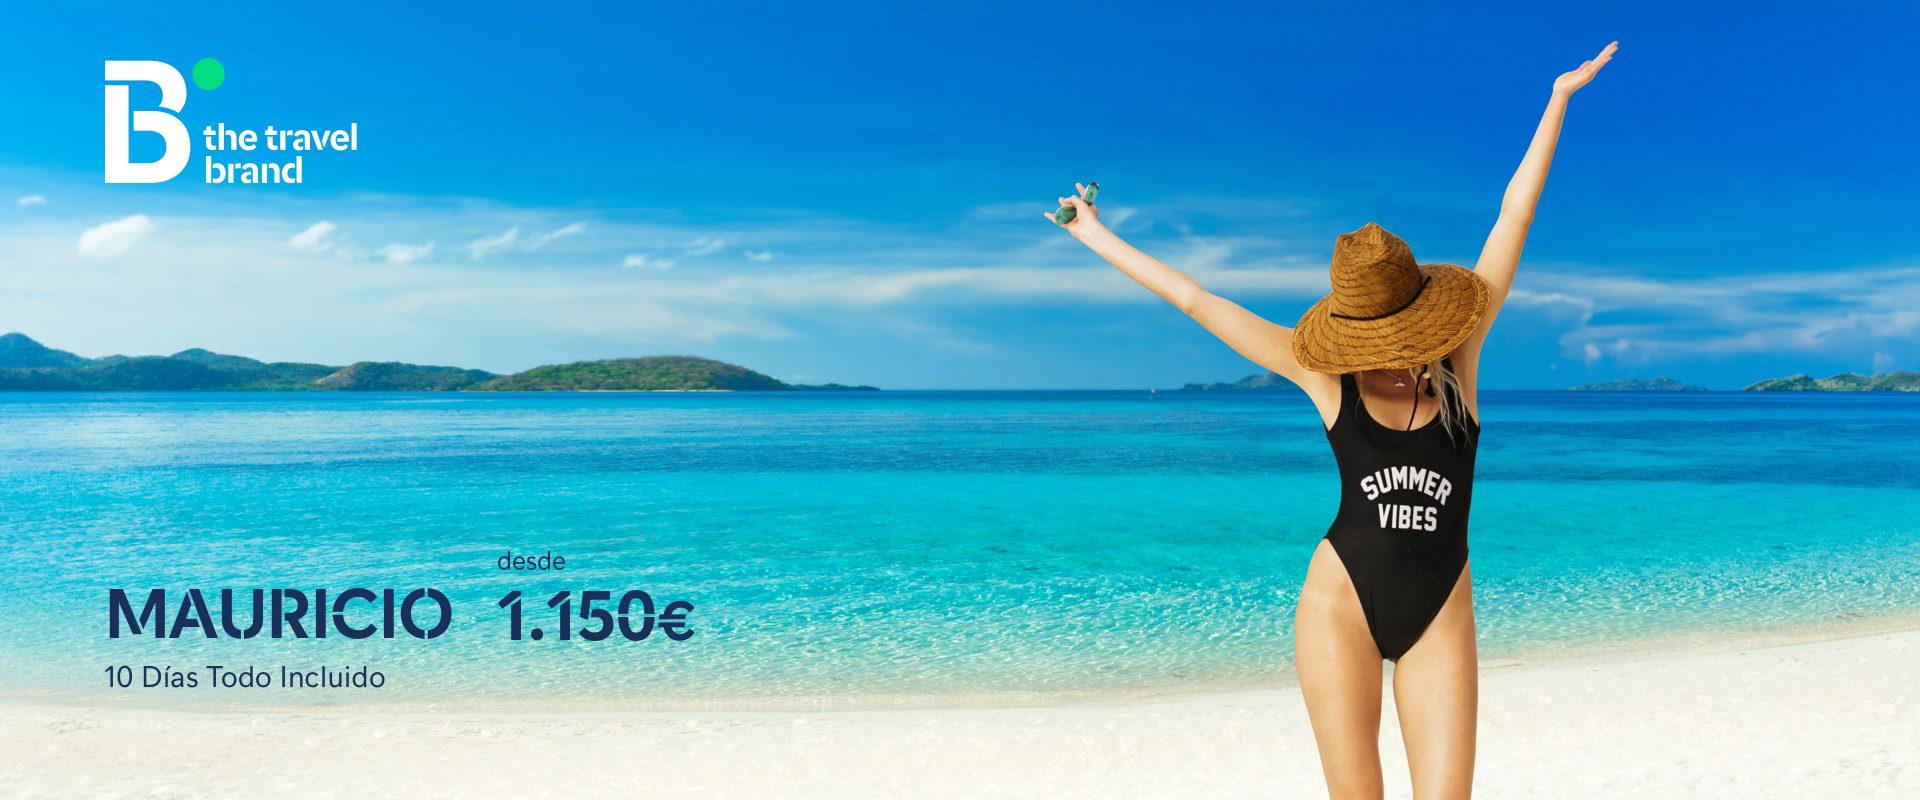 ofertas Mauricio - B the travel brand